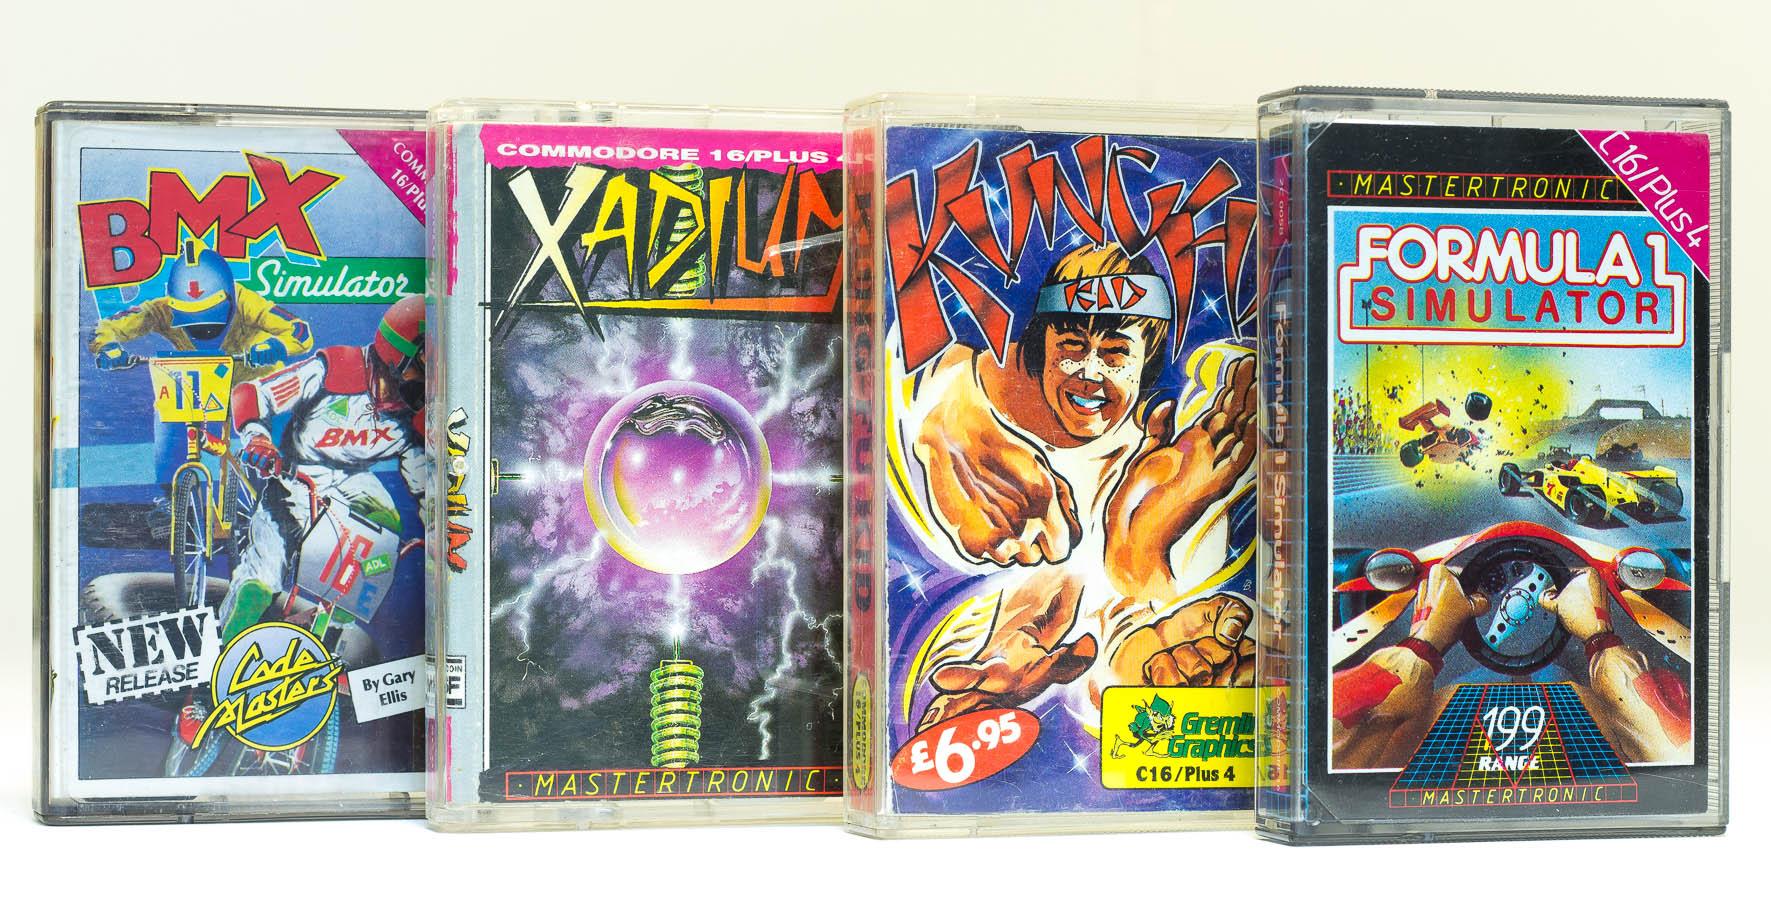 C16 Spielkassetten: BMX Simulator, Xadium, Kung Fu und Formula 1 Simulator. (Bild: Claudio Lione)